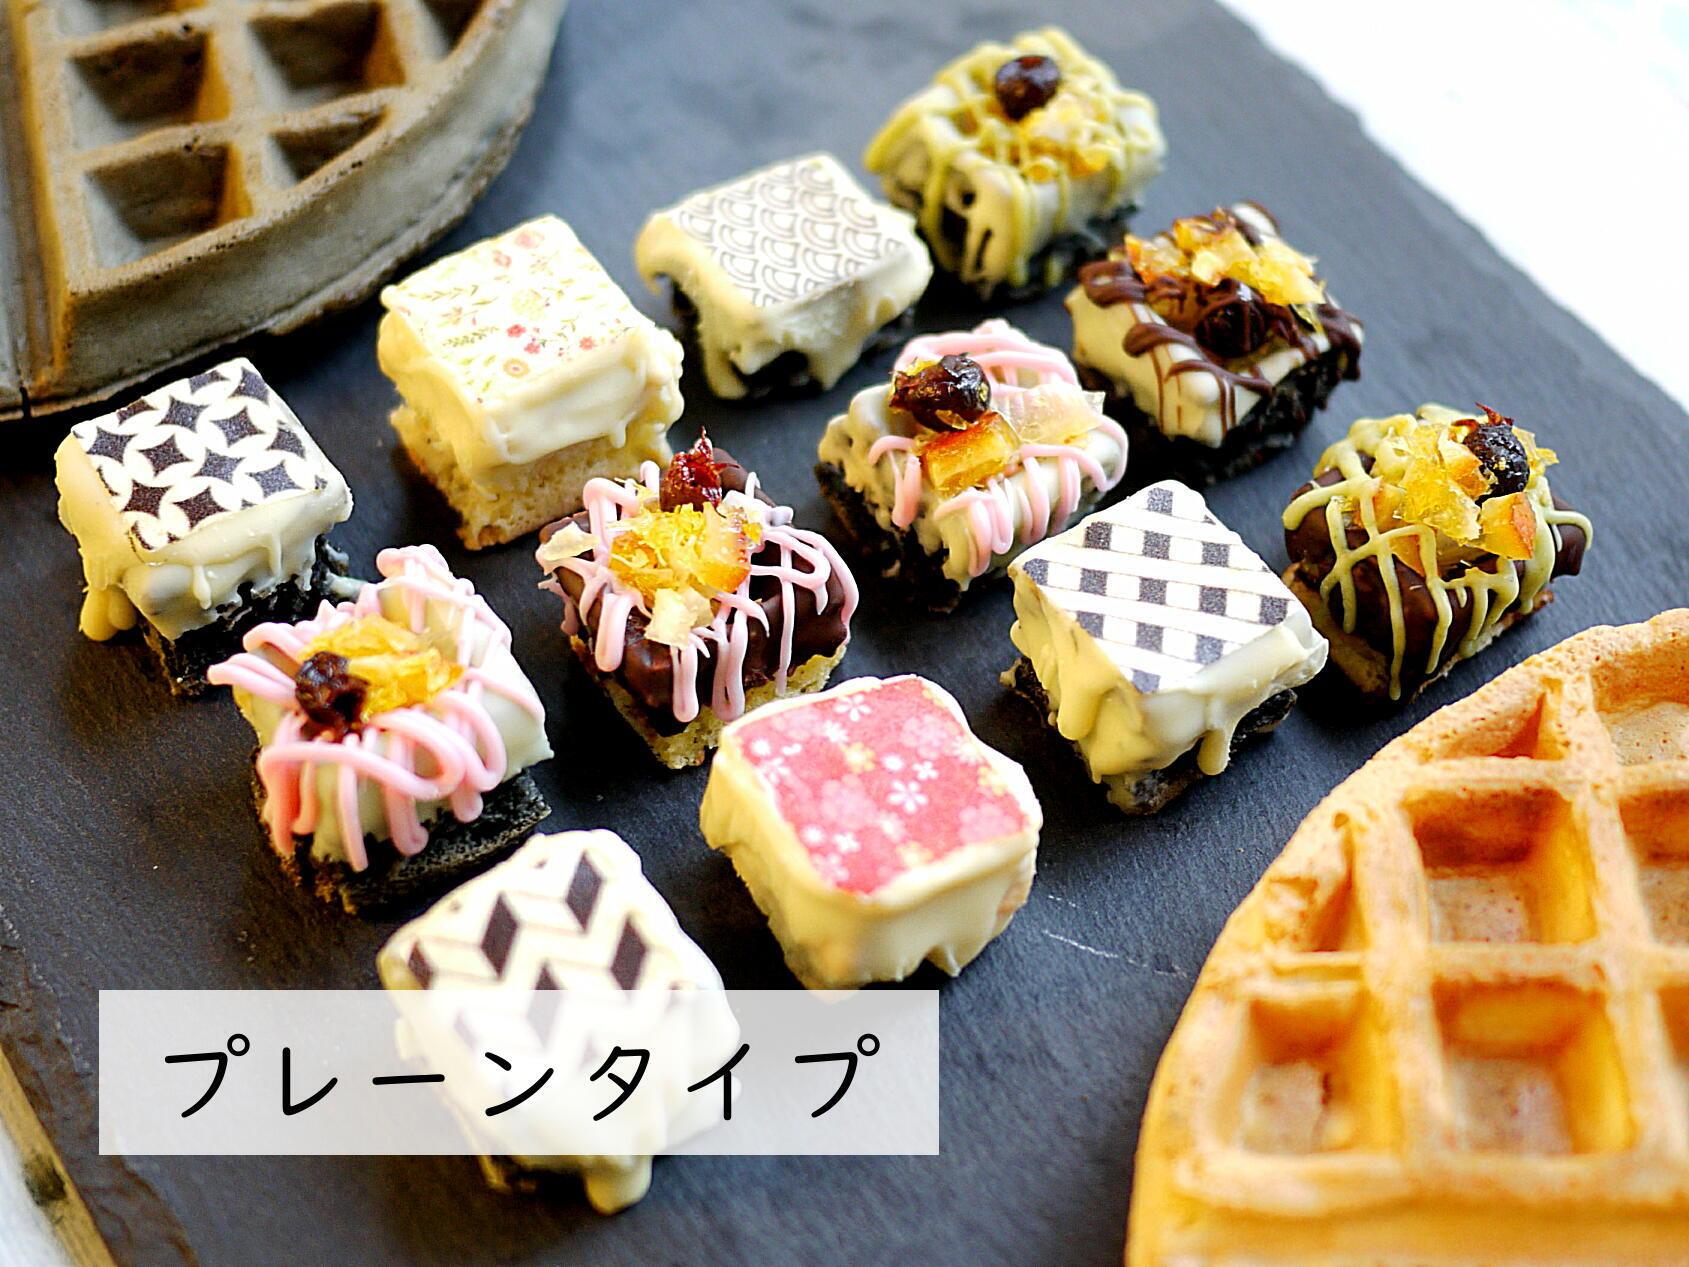 Koso Waffle Cubeプレーンタイプ/5個入